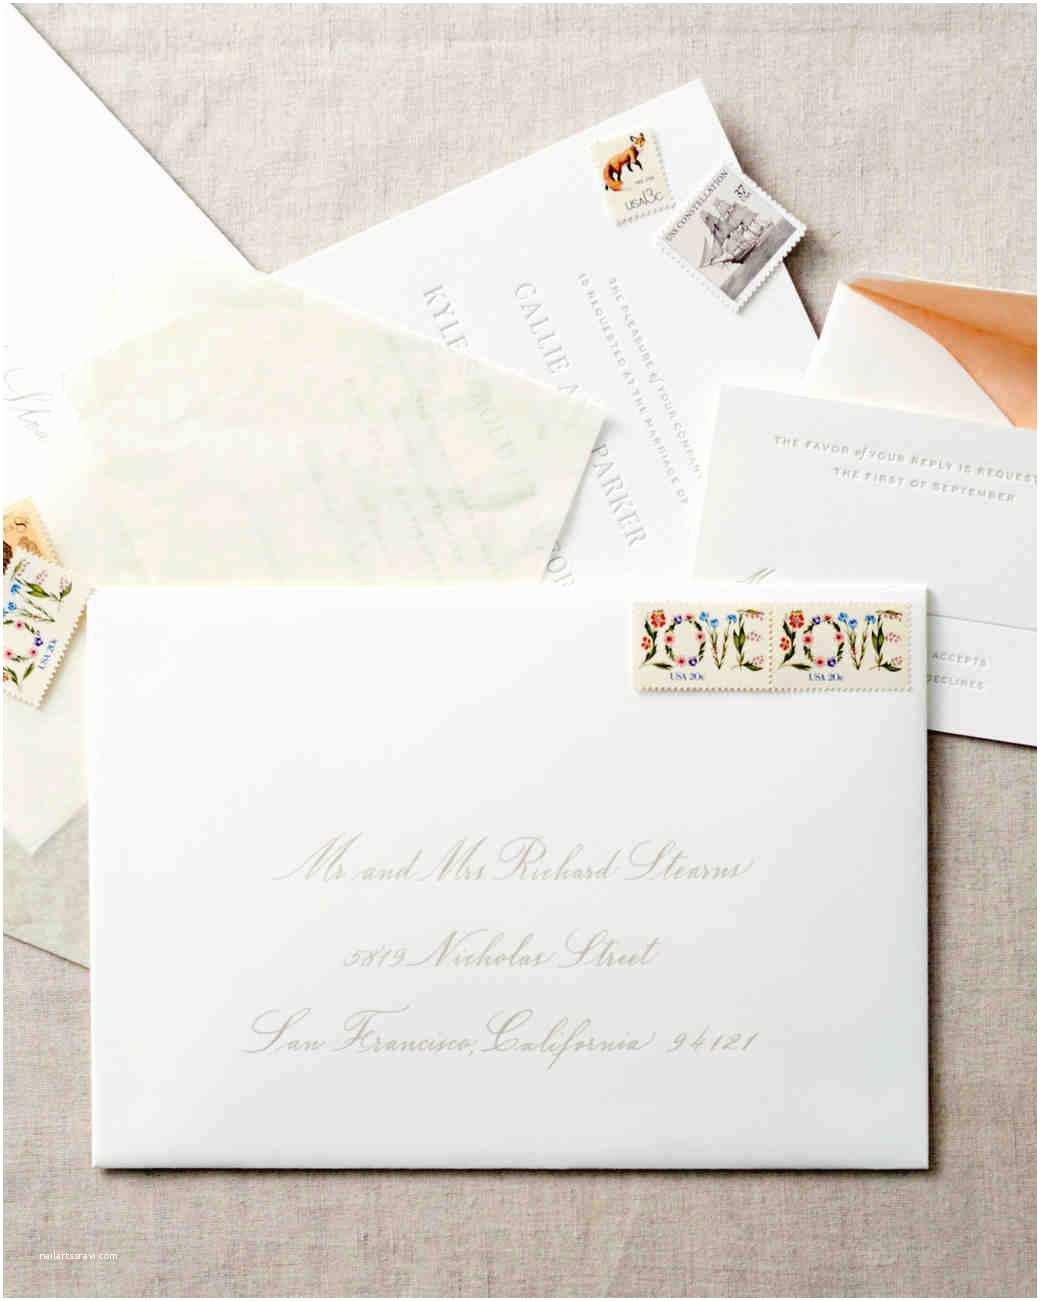 Envelope Etiquette for Wedding Invitations Wedding Invitation Envelope Etiquette – Gangcraft